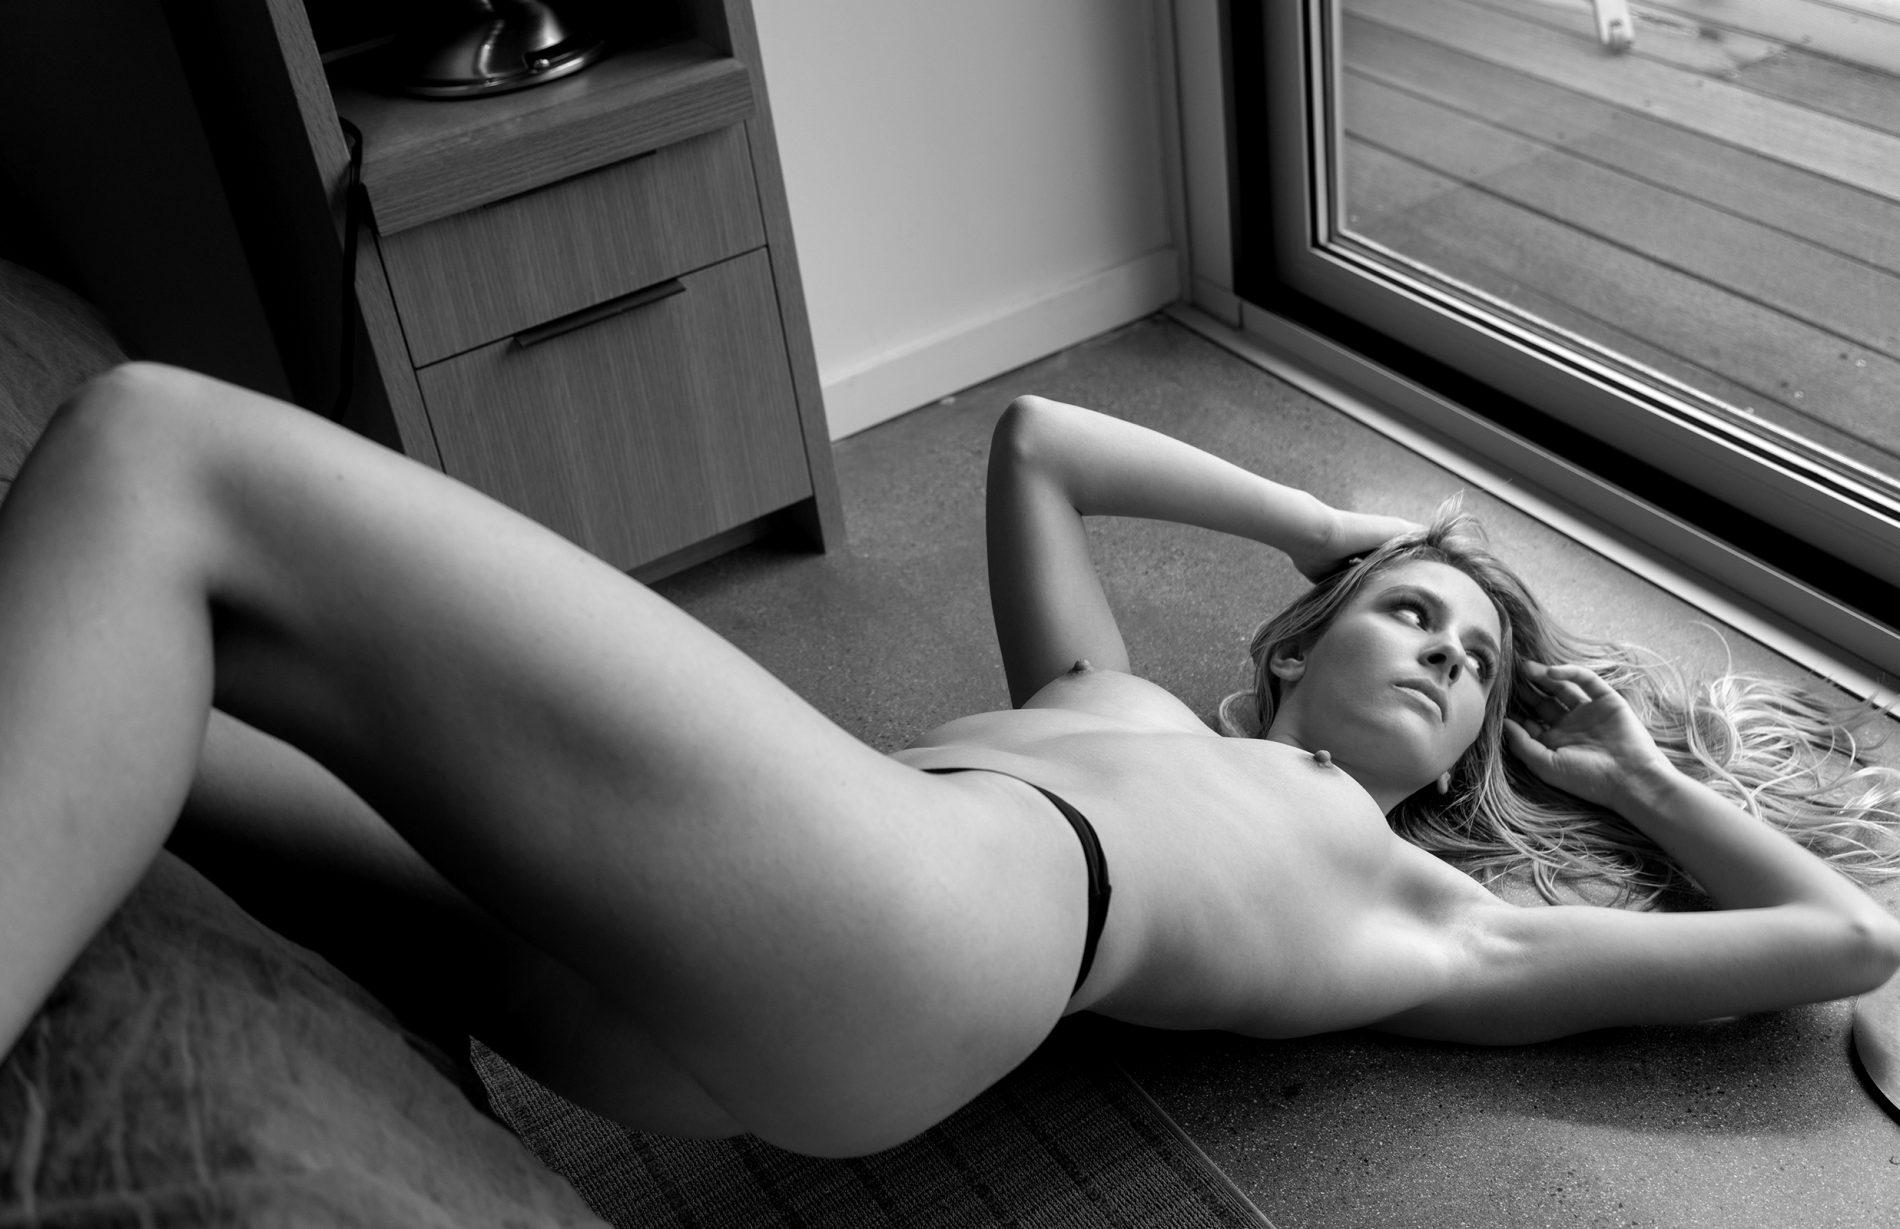 Cityscapes Women  photoshooting photoshoot photography photographer nudes nude art nude models lionsmag lions magazine lingerie body art body blackandwhite   // lionsmag.com - premium nude photography magazine